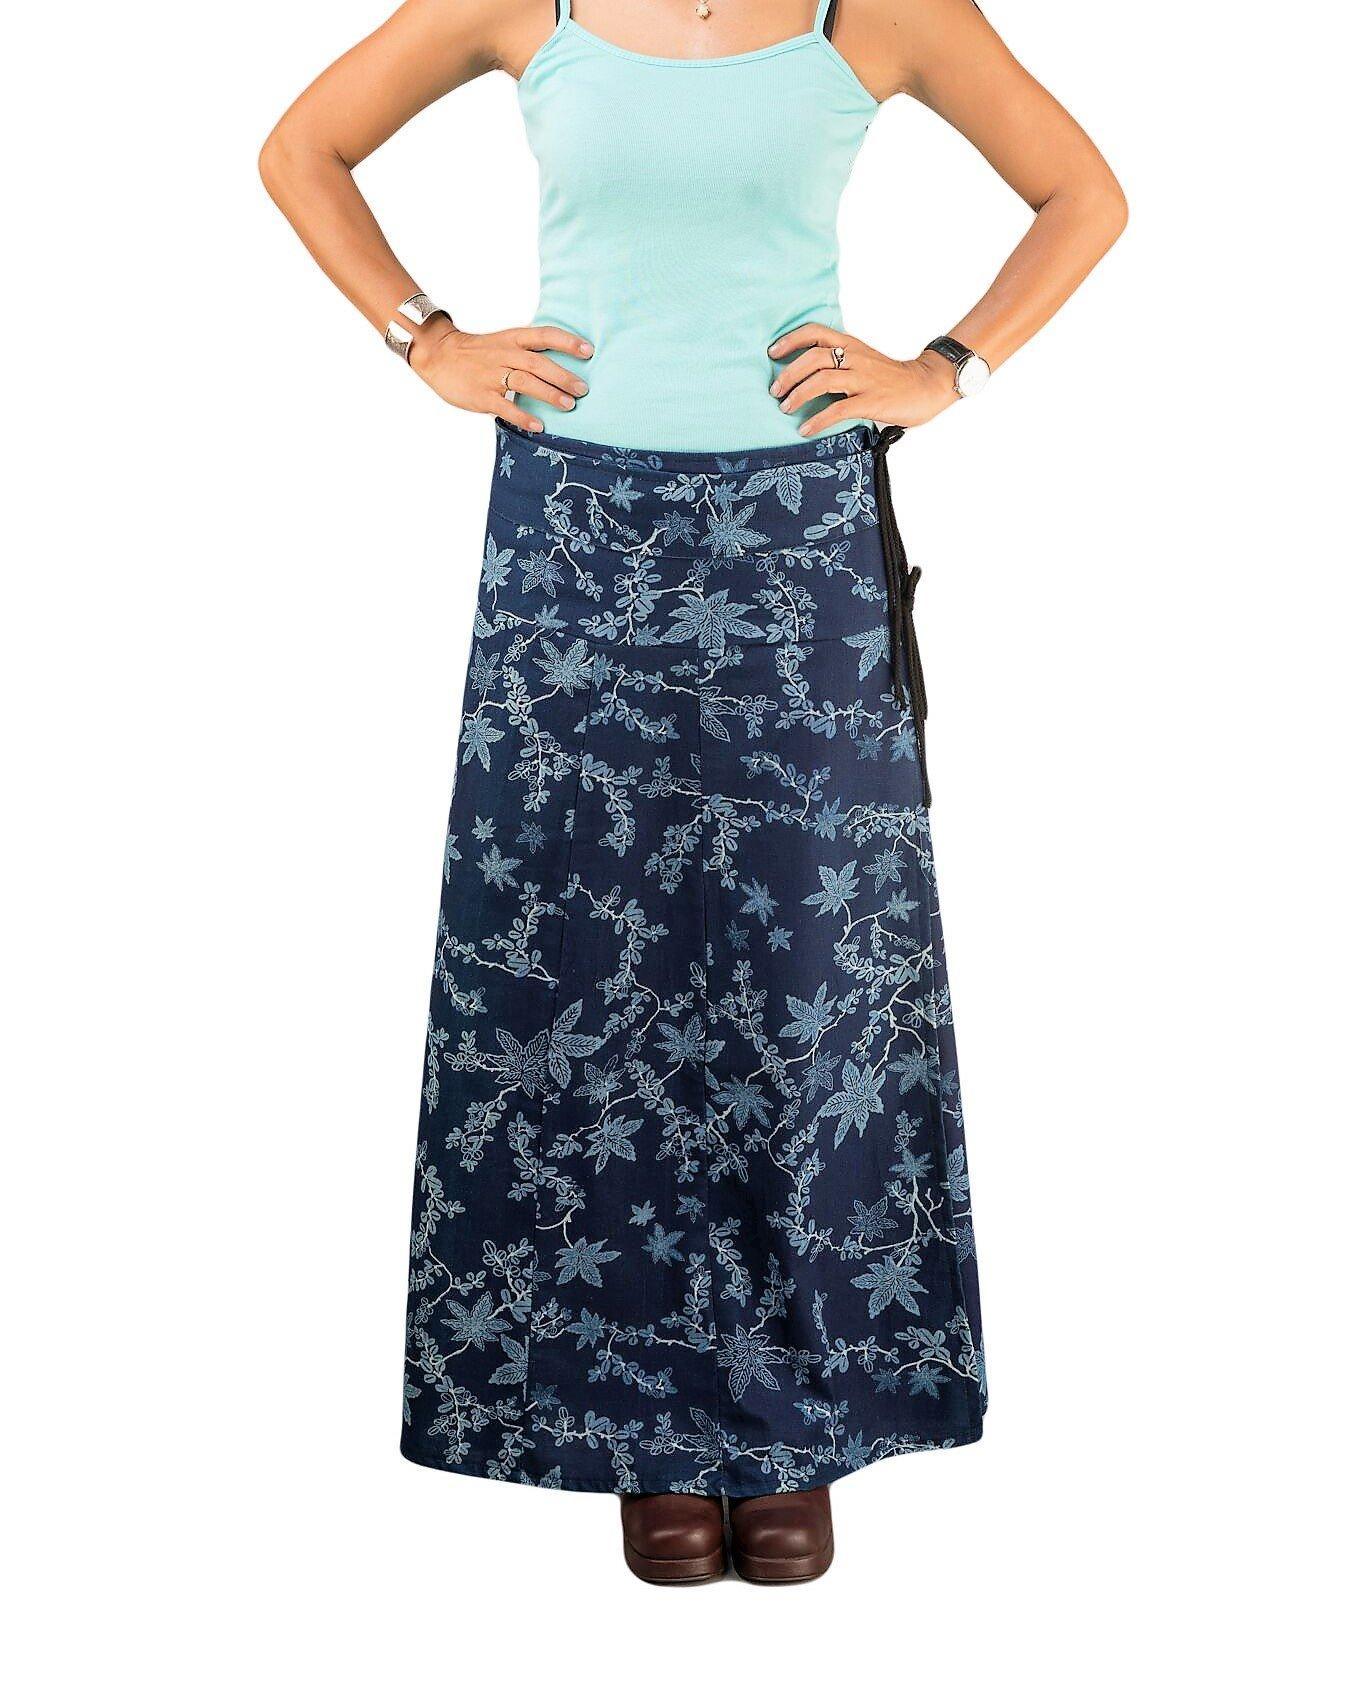 Women's A-line Cotton Wrap Skirt Floral Maxi Long Soft Indigo Navy Autumn Smart Casual Loose